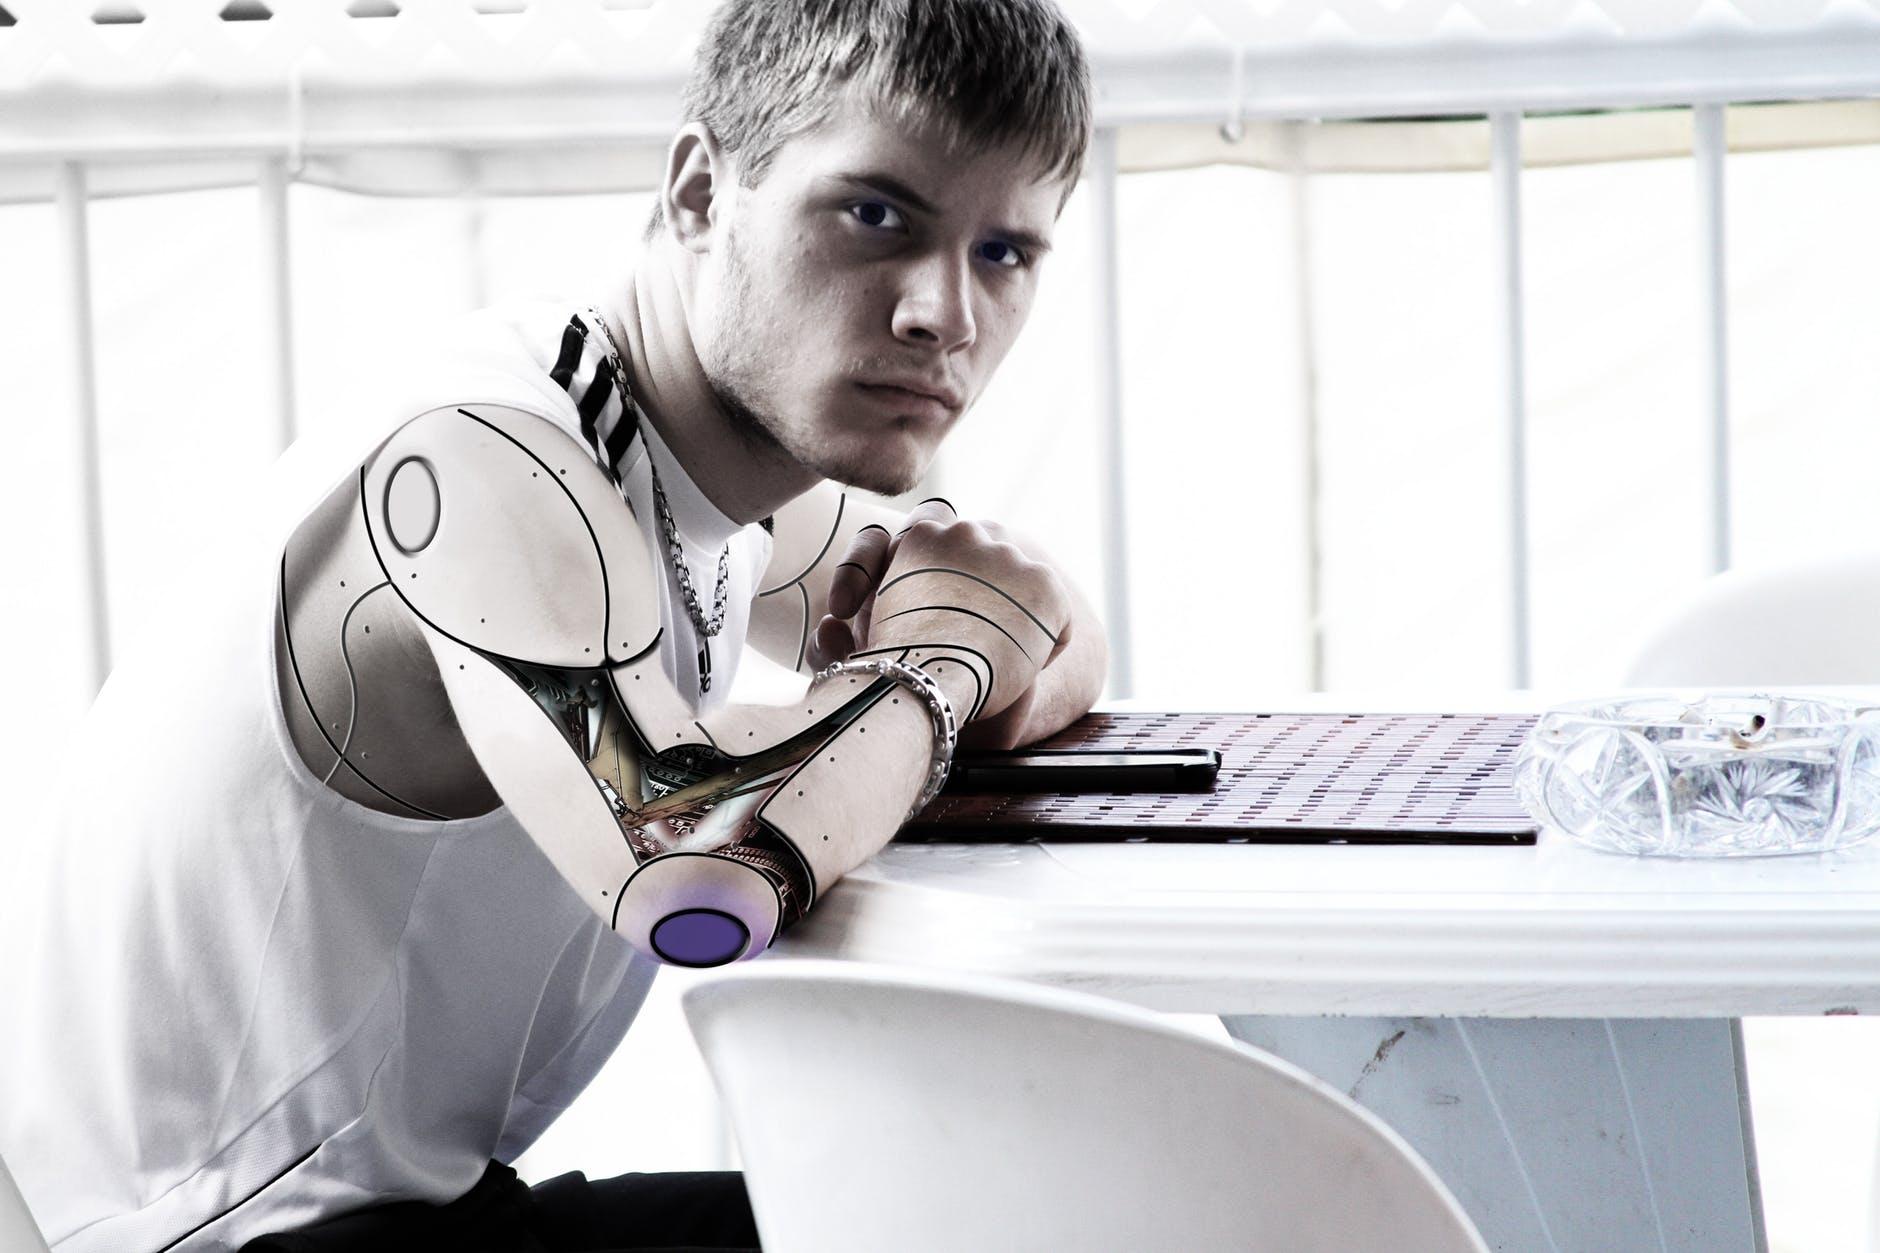 hpn robot2.jpeg